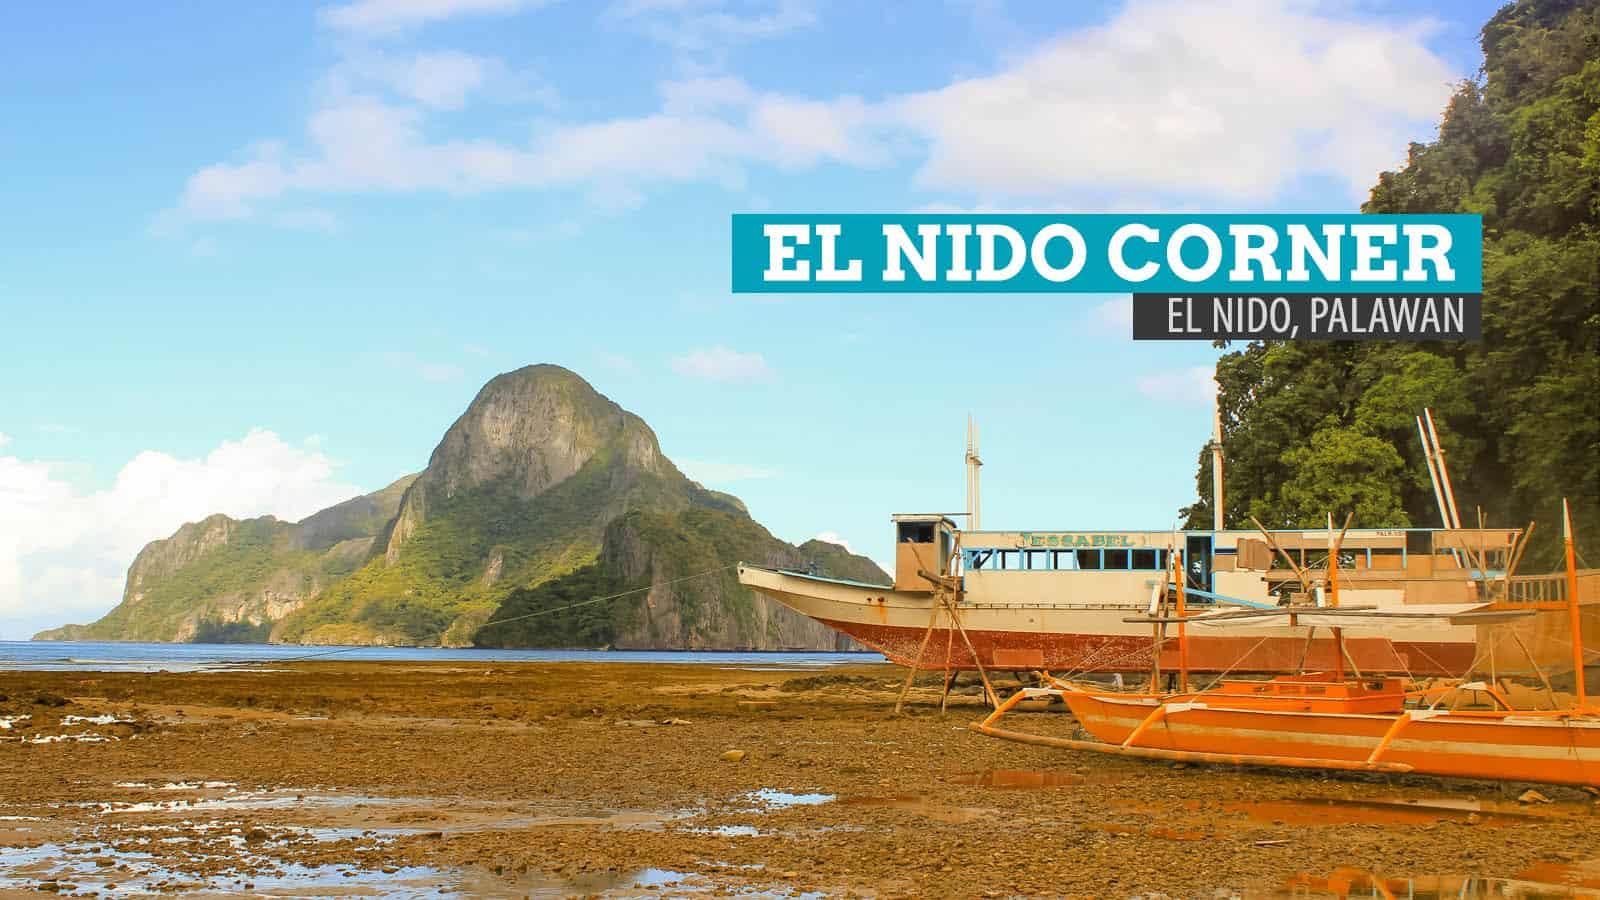 El Nido Corner: Where to Eat in El Nido, Palawan (Splurge Option)